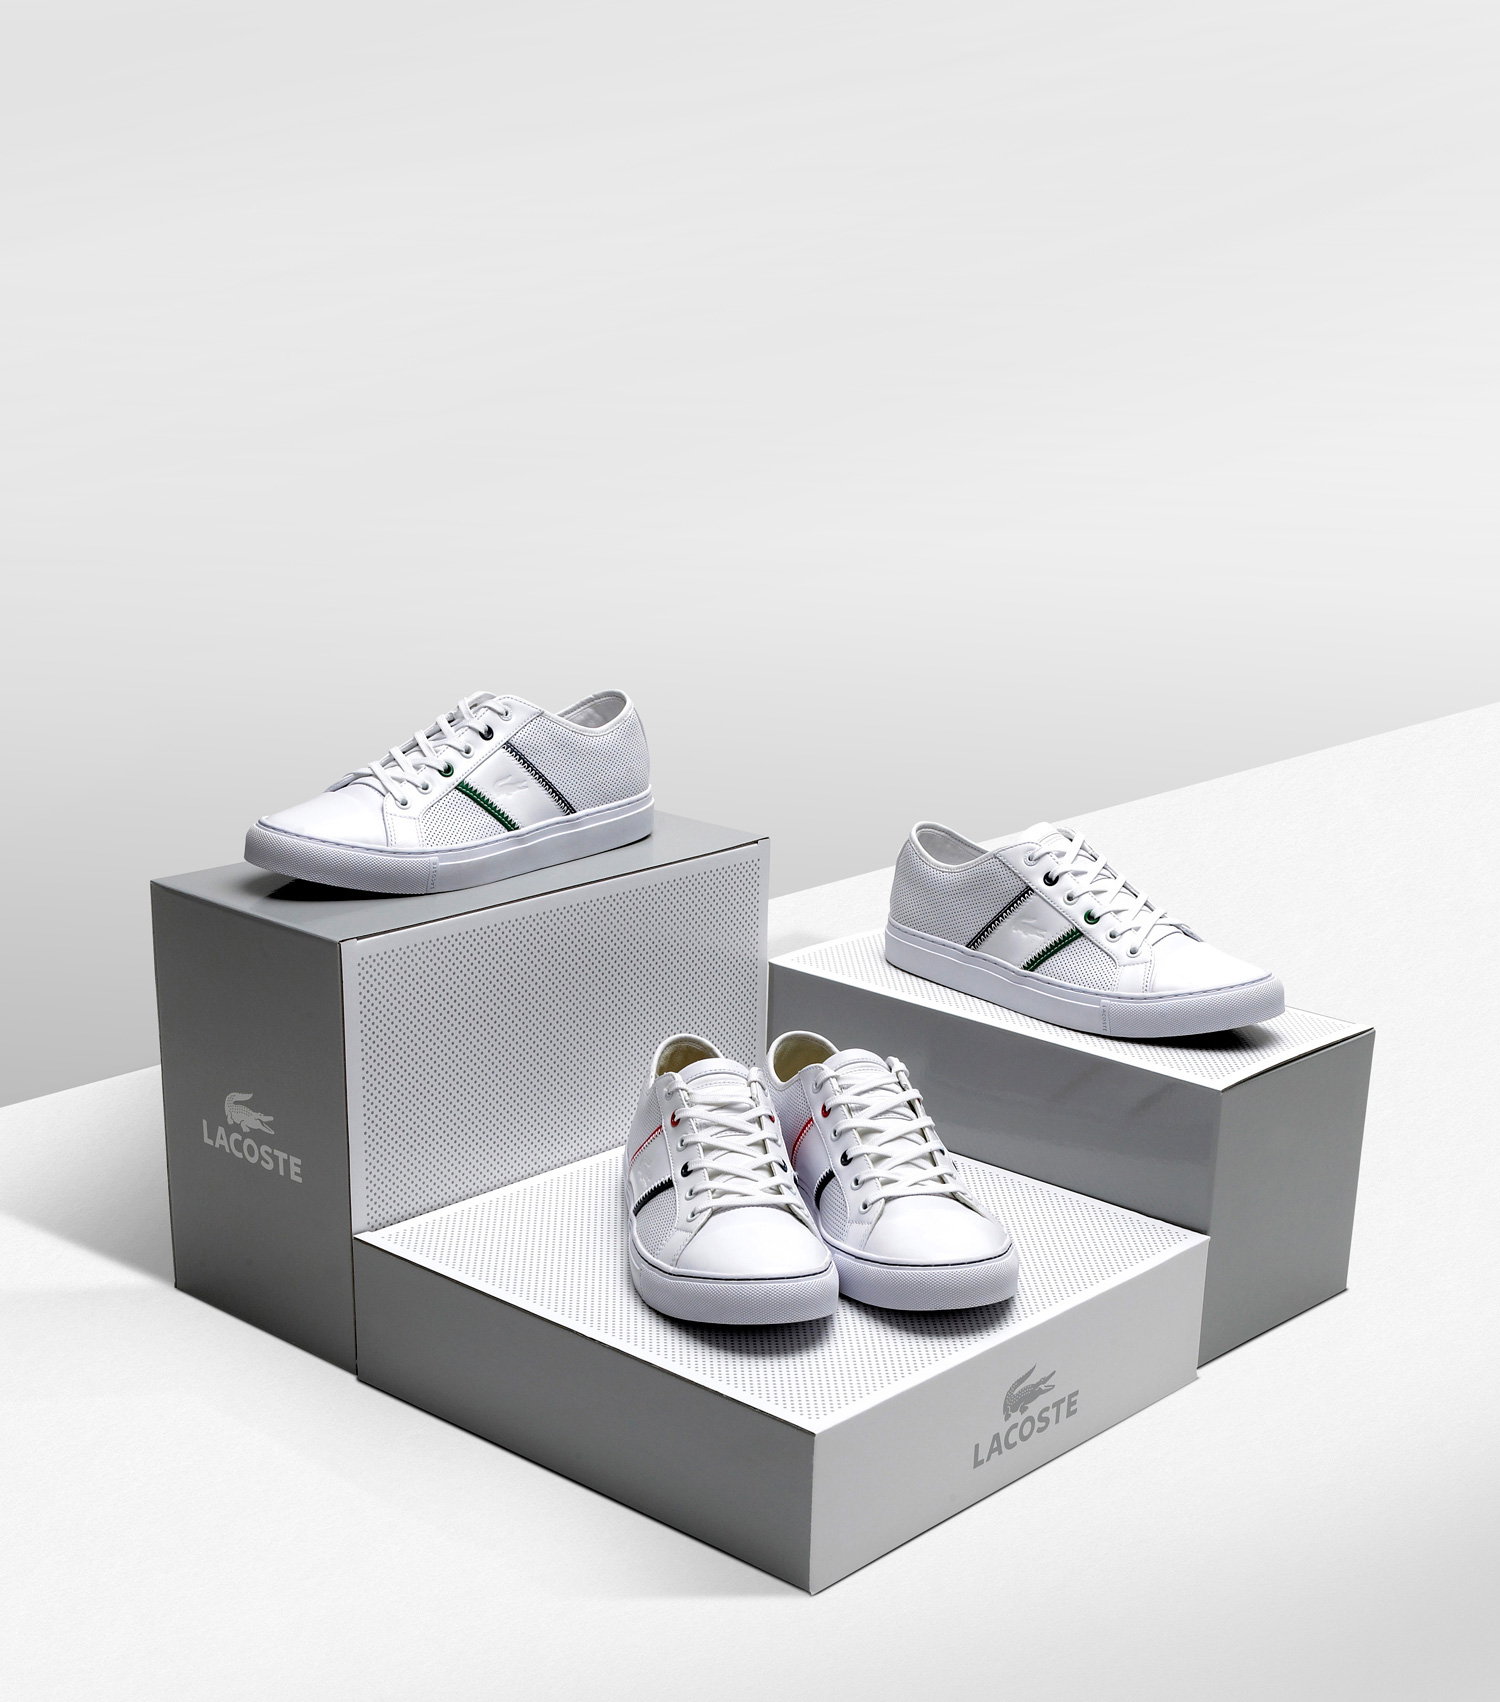 Progress Packaging Lacoste Fashion Retail Boxes Sports POS